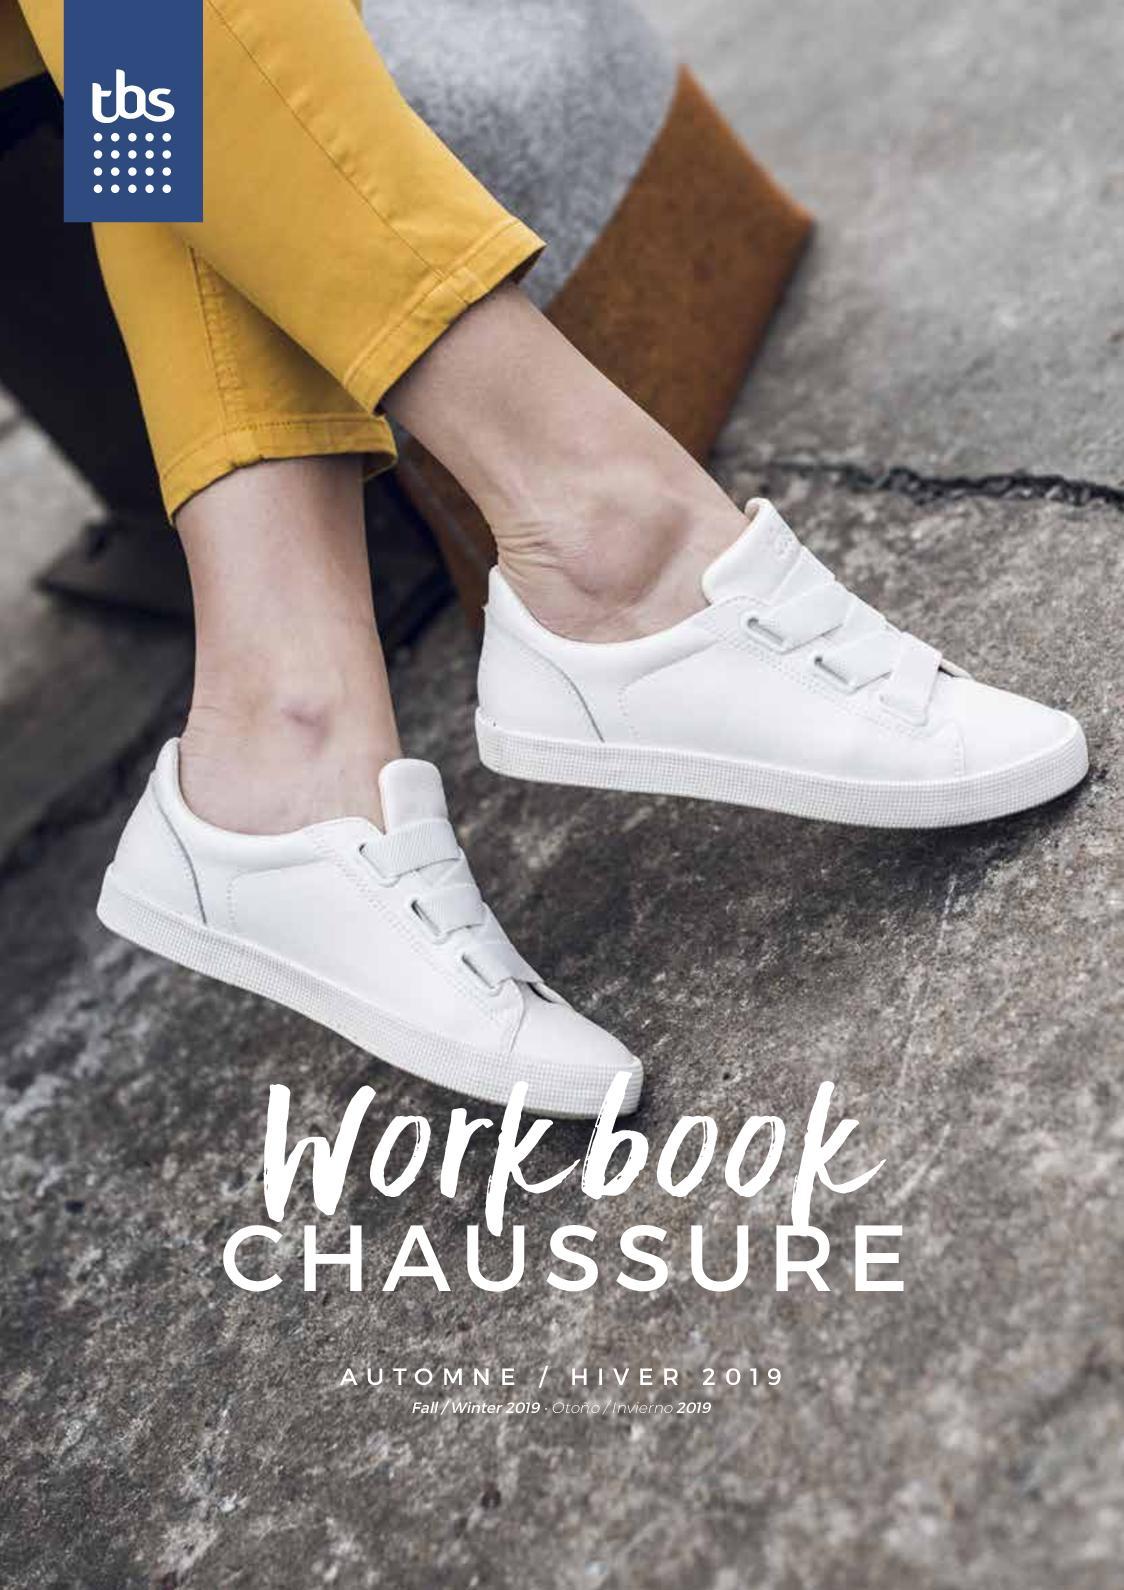 H19 Workbook Chaussure Fw19 Calaméo Shoes KF1lJc